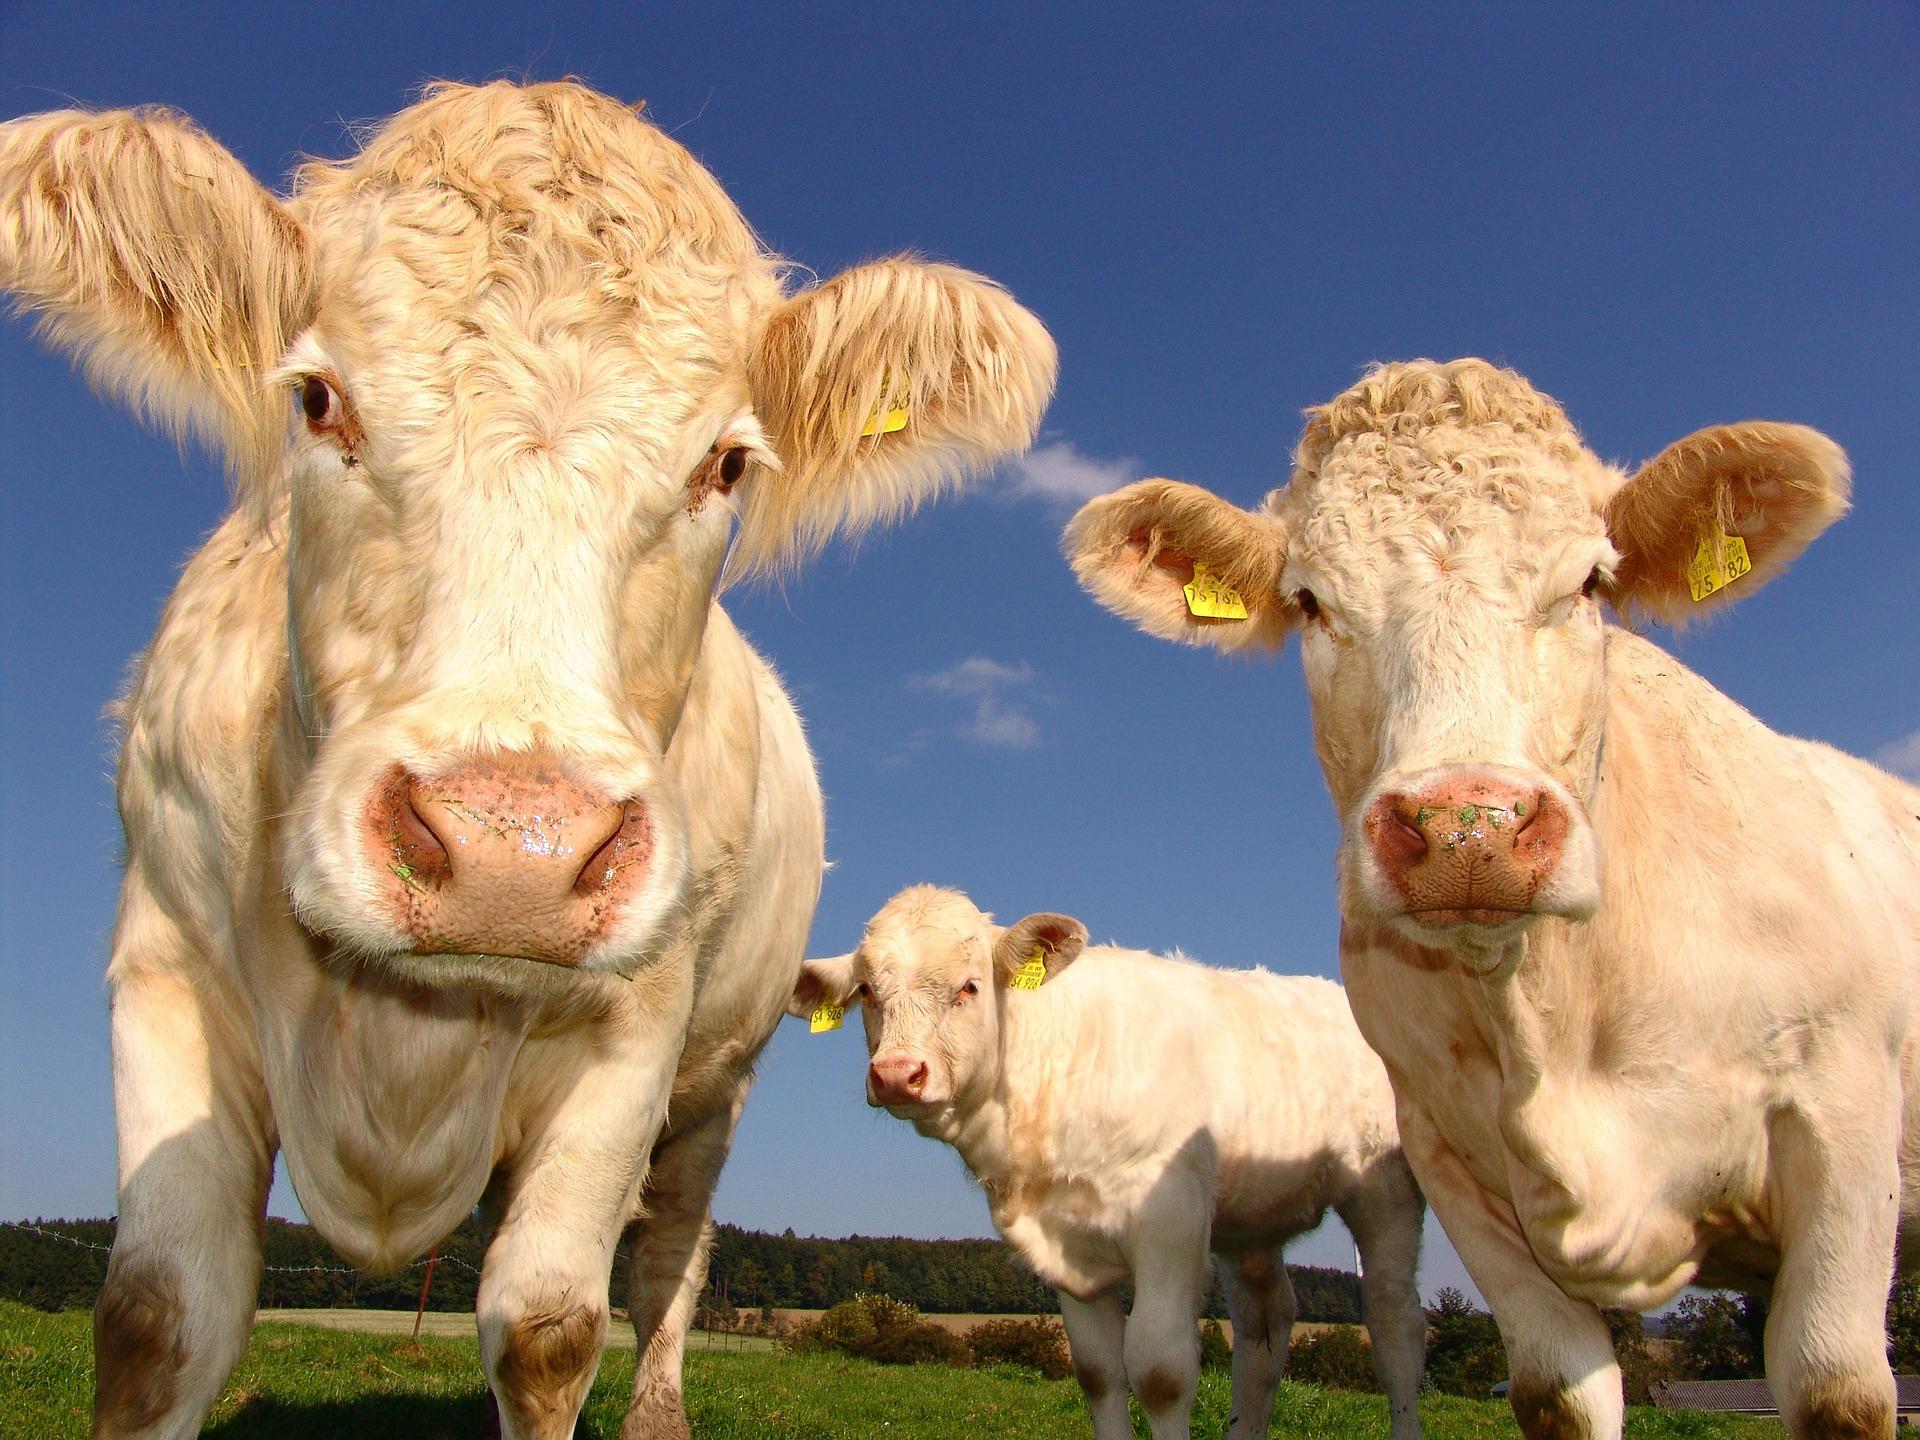 cows-1029077-1920.jpg